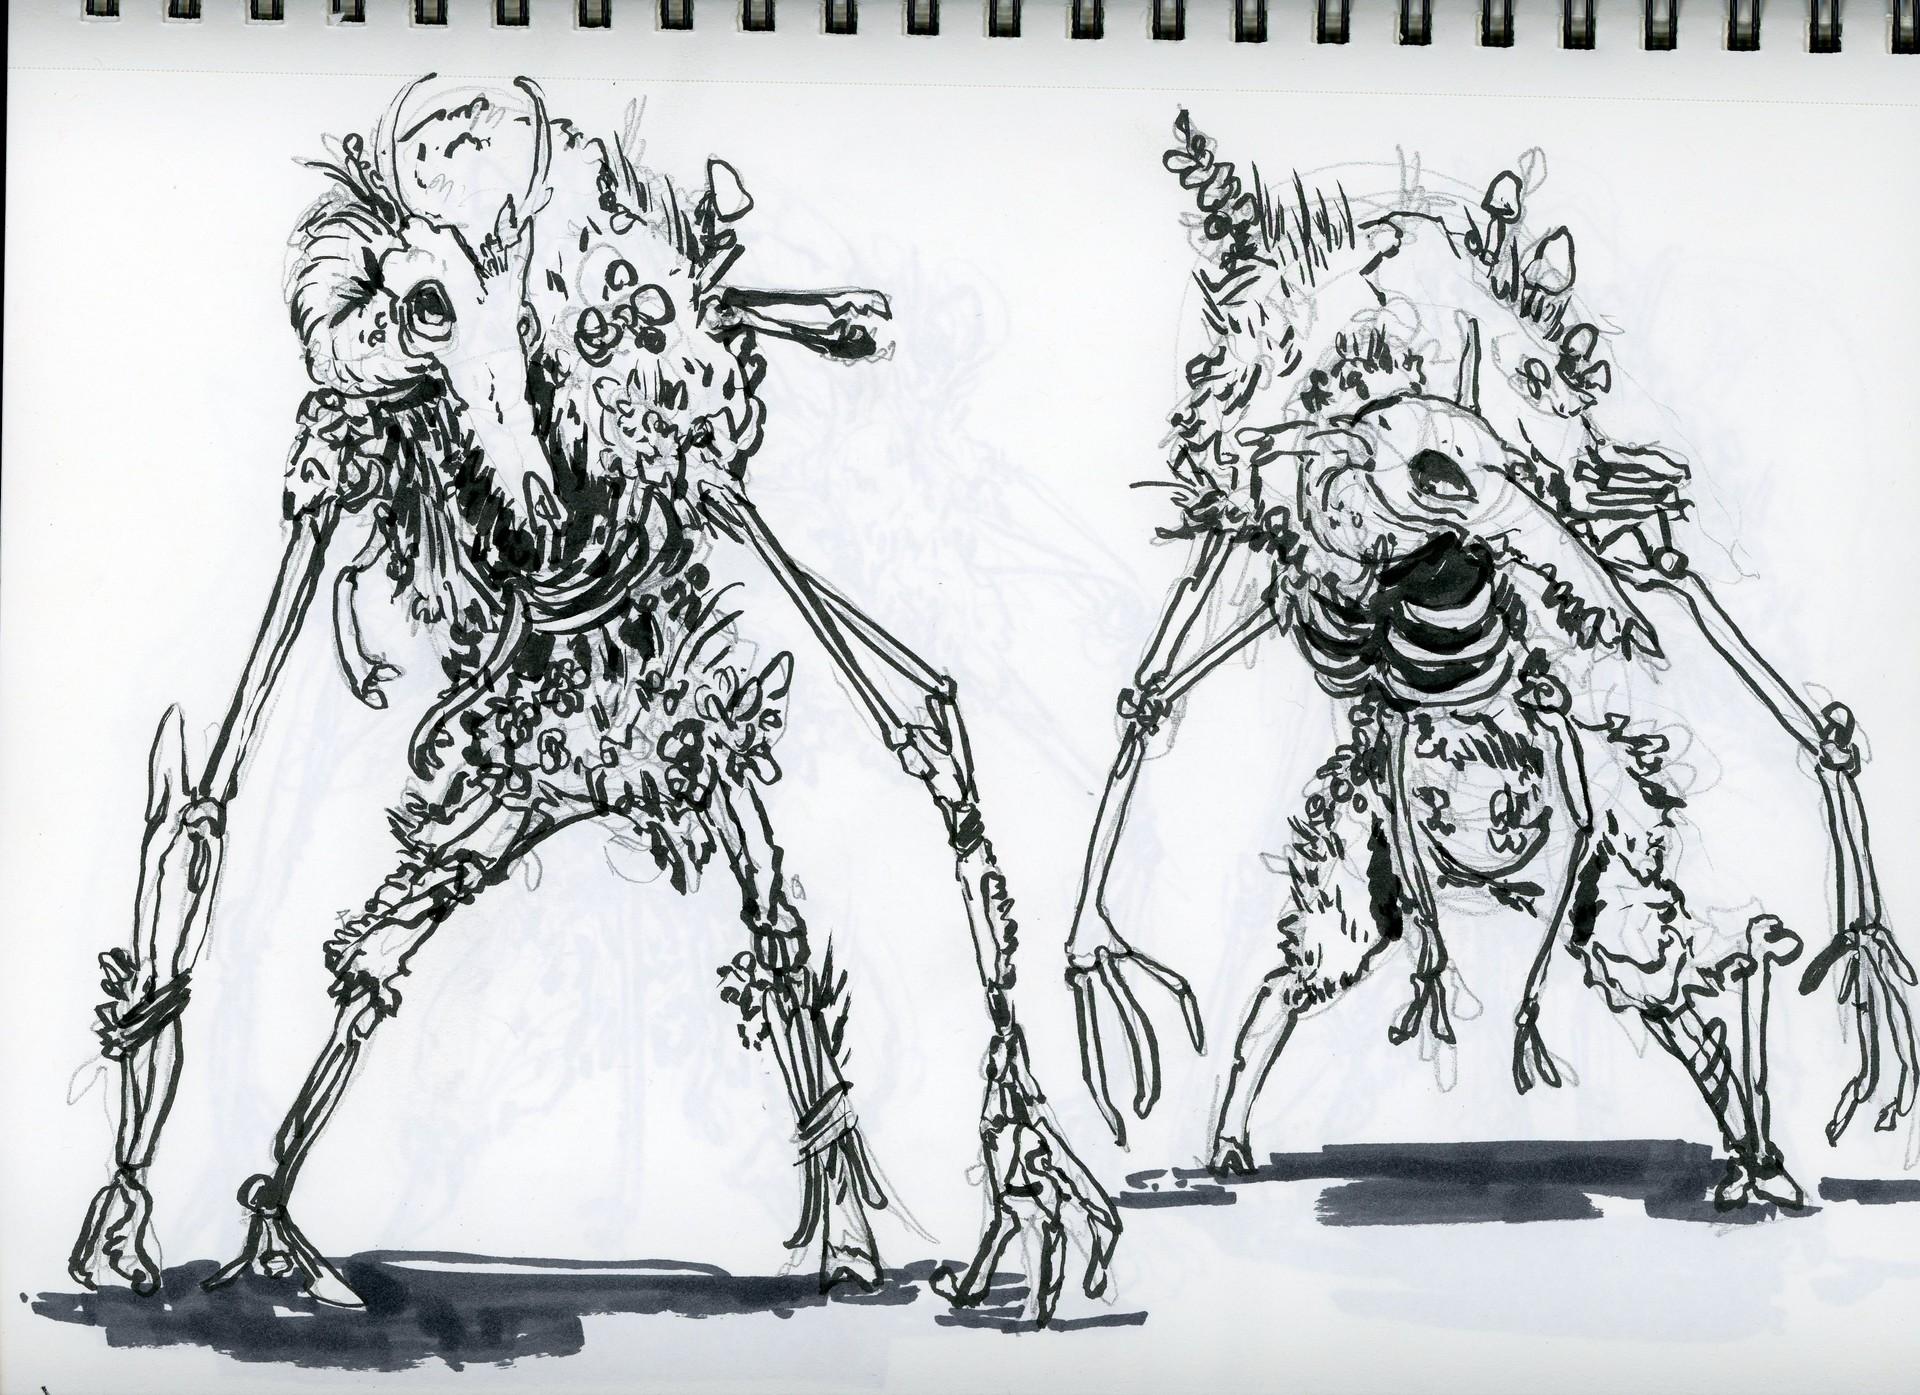 Ethan yazel monster003 2